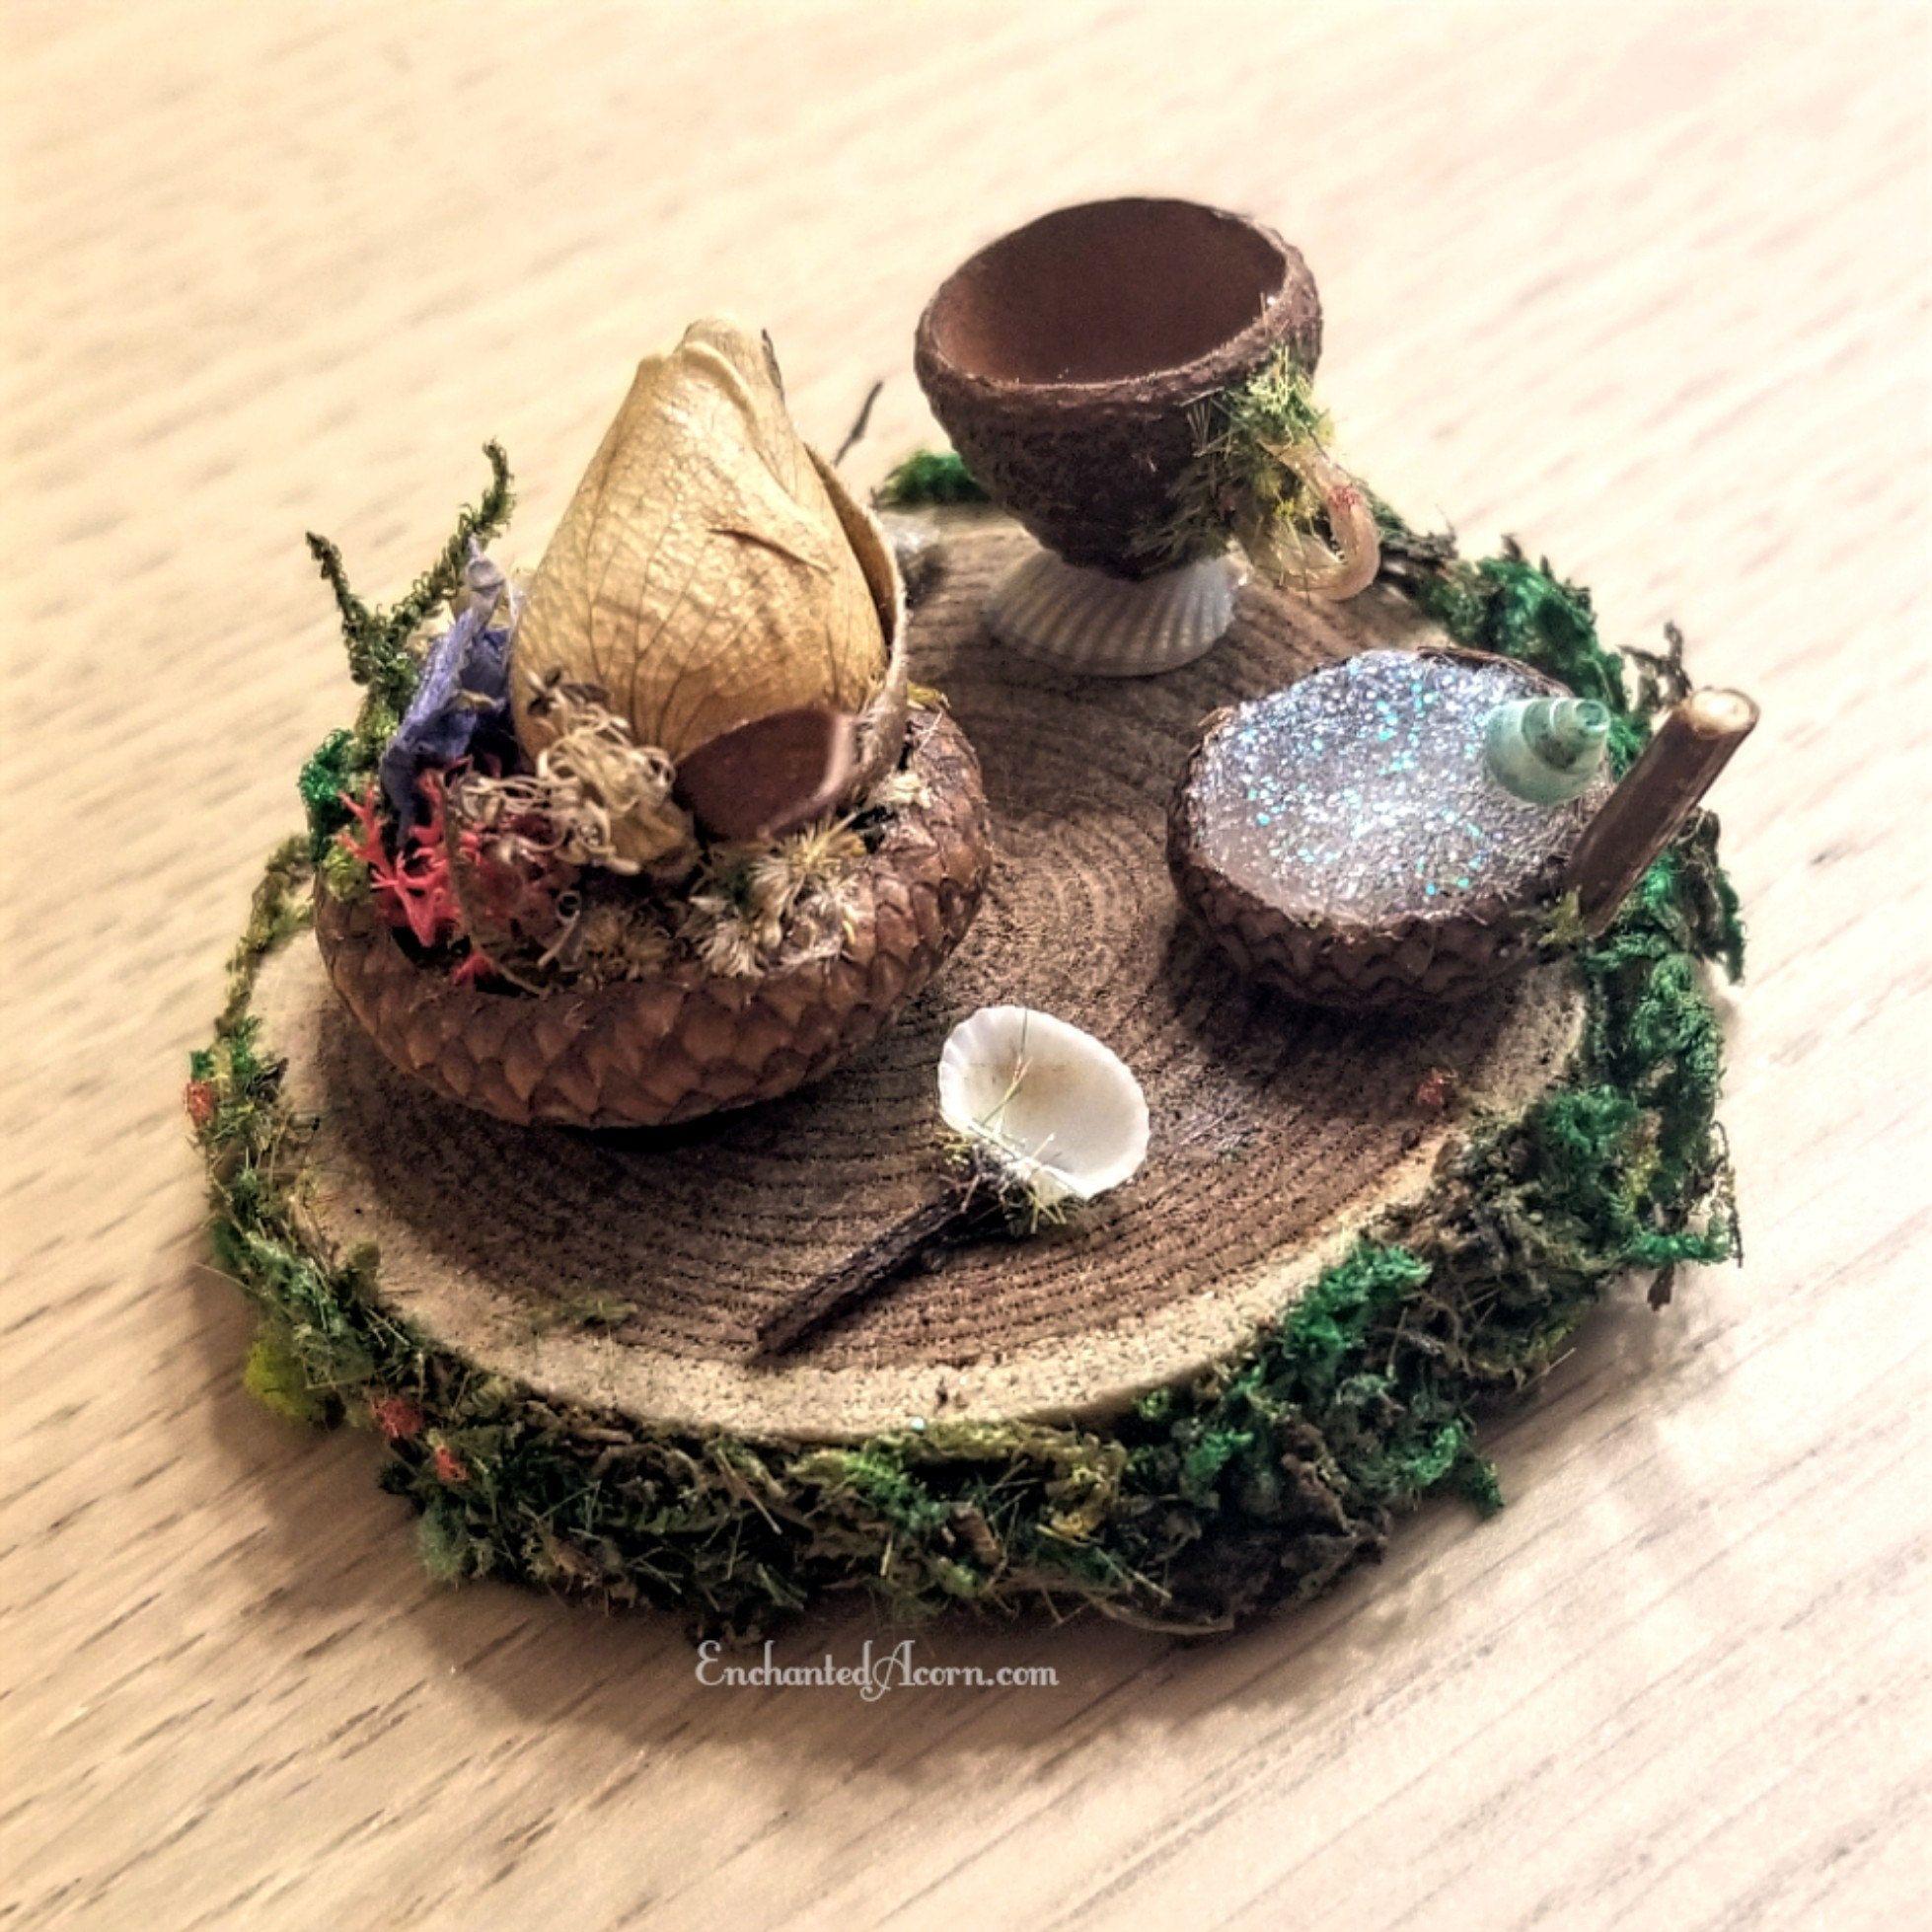 Fall Decor Miniatures Fairy Garden Holiday Craft 101 Small Acorn Cap Buttons